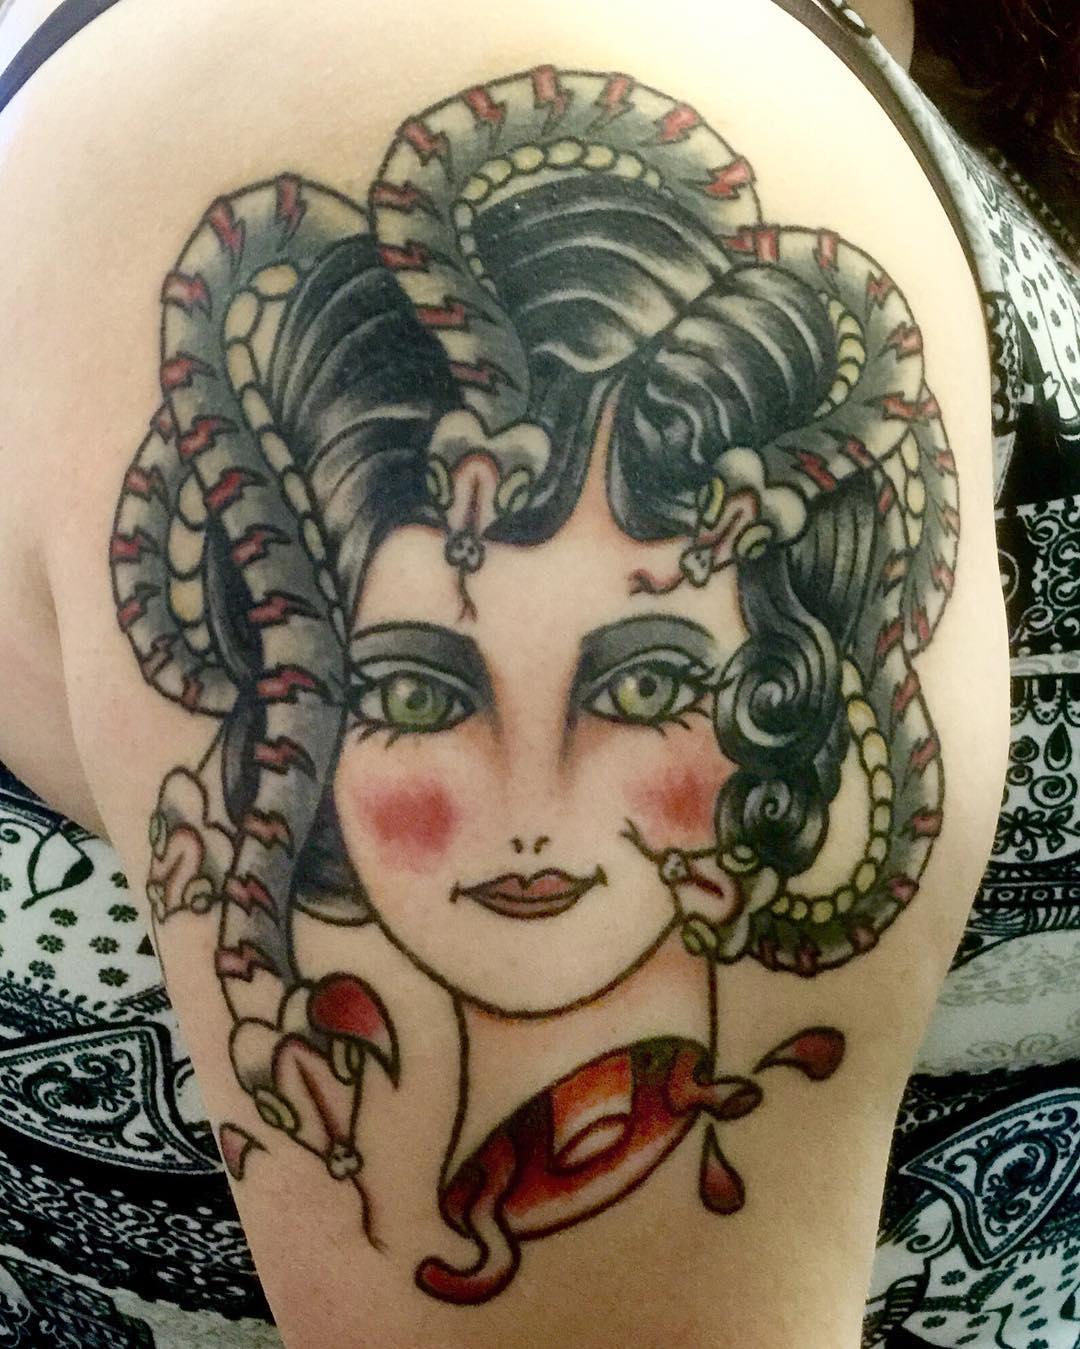 Medusa Illustration Tattoo: 105+ Bewitching Medusa Tattoo Designs & Meaning